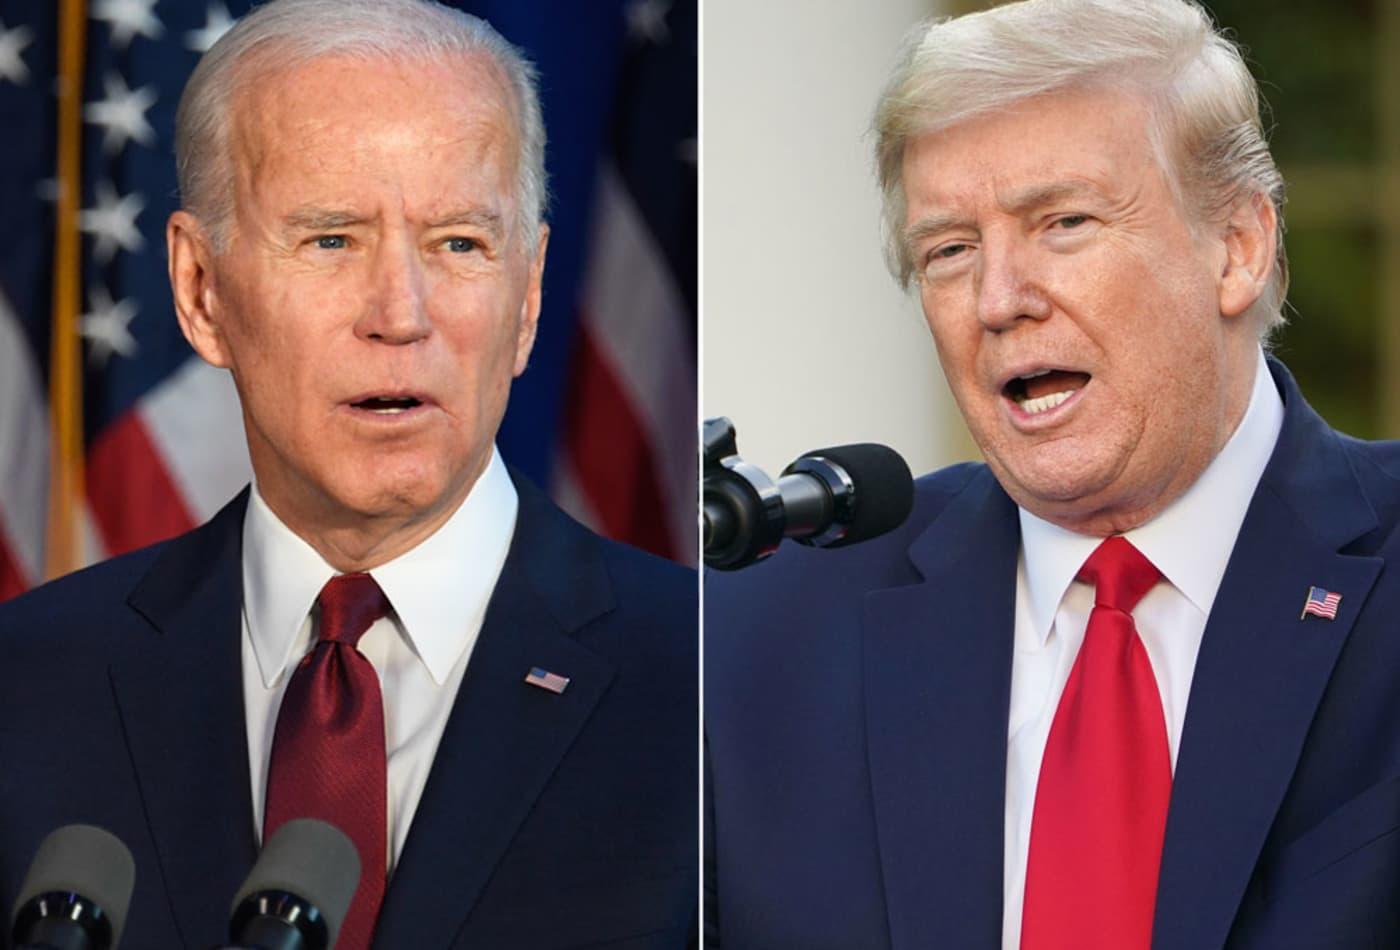 Wall Street is underpricing a Joe Biden presidential win, Wells Fargo's Chris Harvey warns